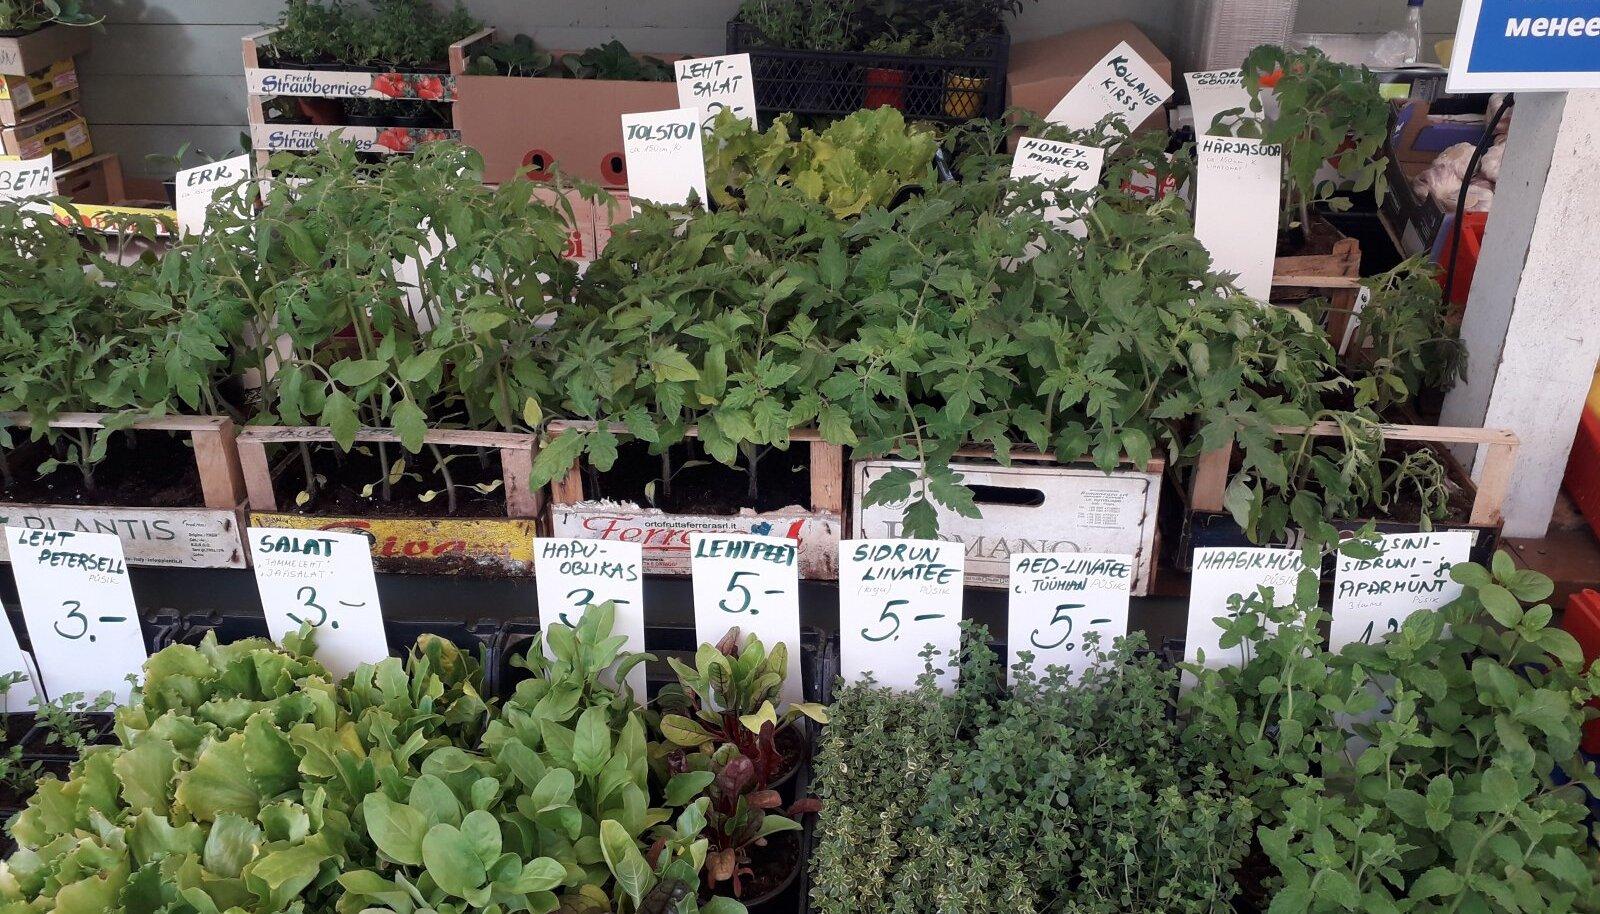 Nõmme turg rohetab taimedest.